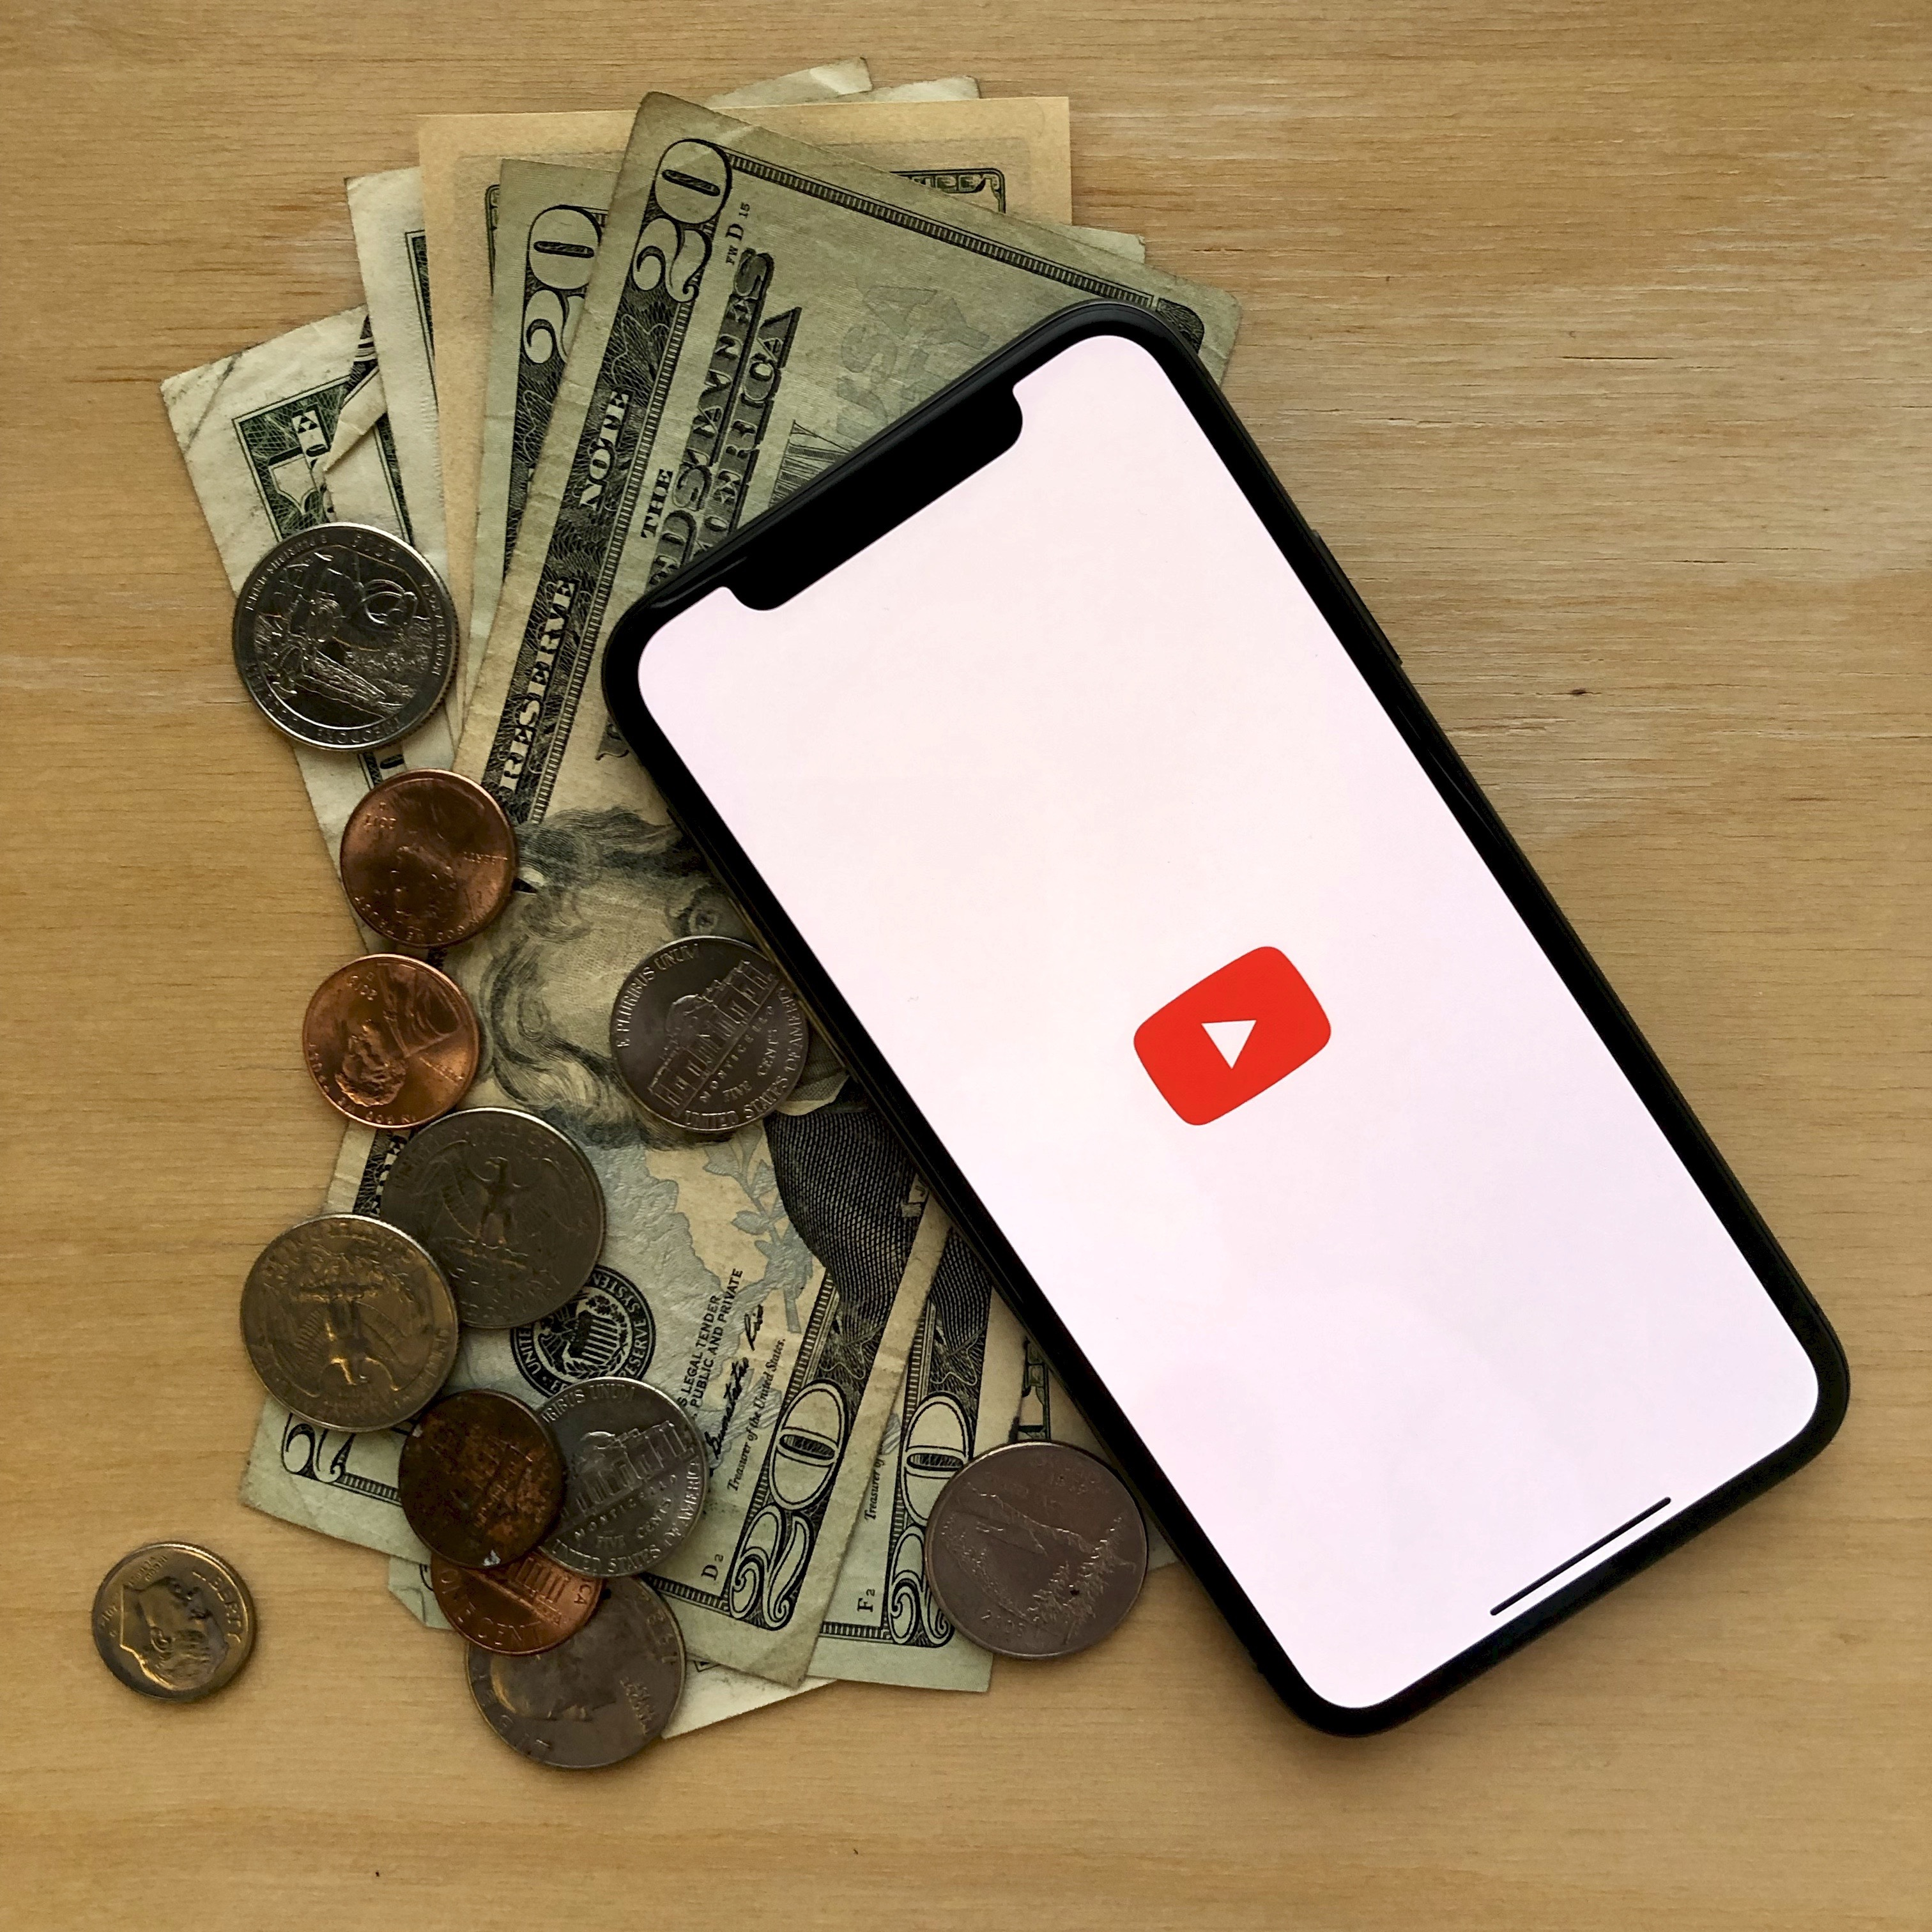 YouTube monetization Photo by Pfeiffer Law